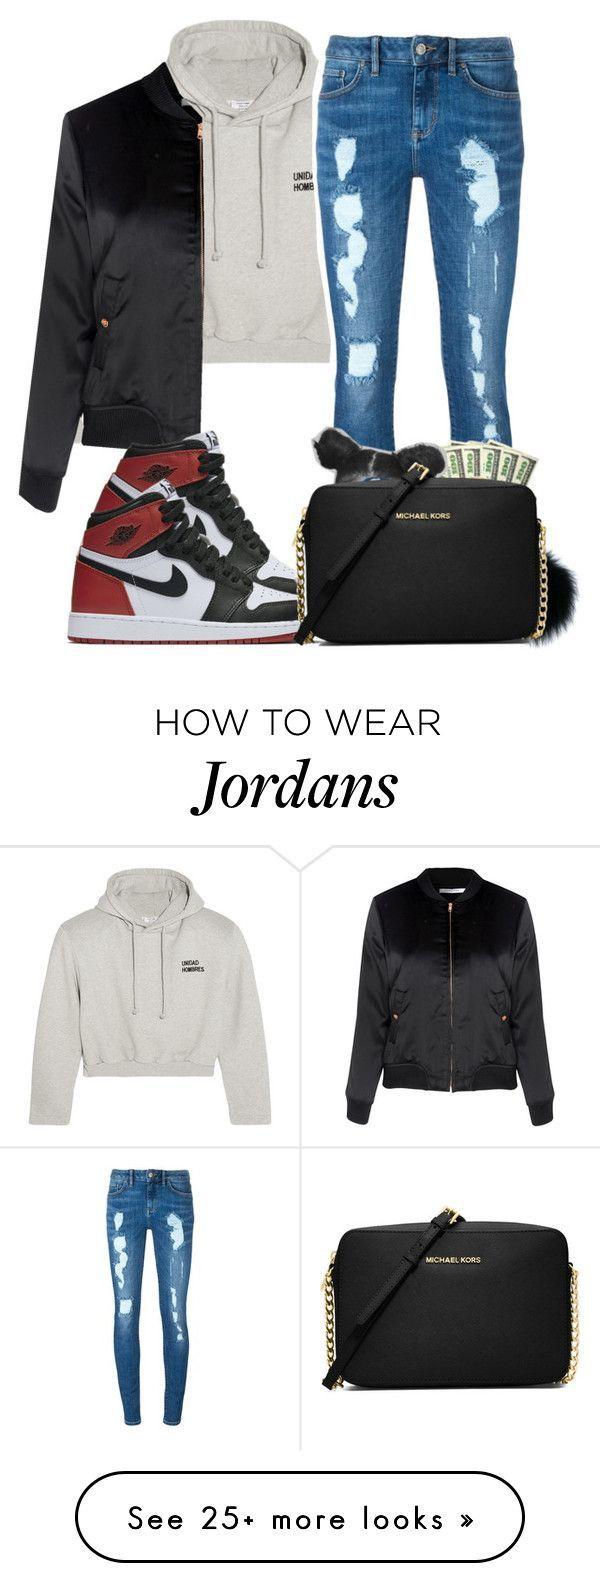 summer outfits with jordans 22+ best outfits - larisoltd.com